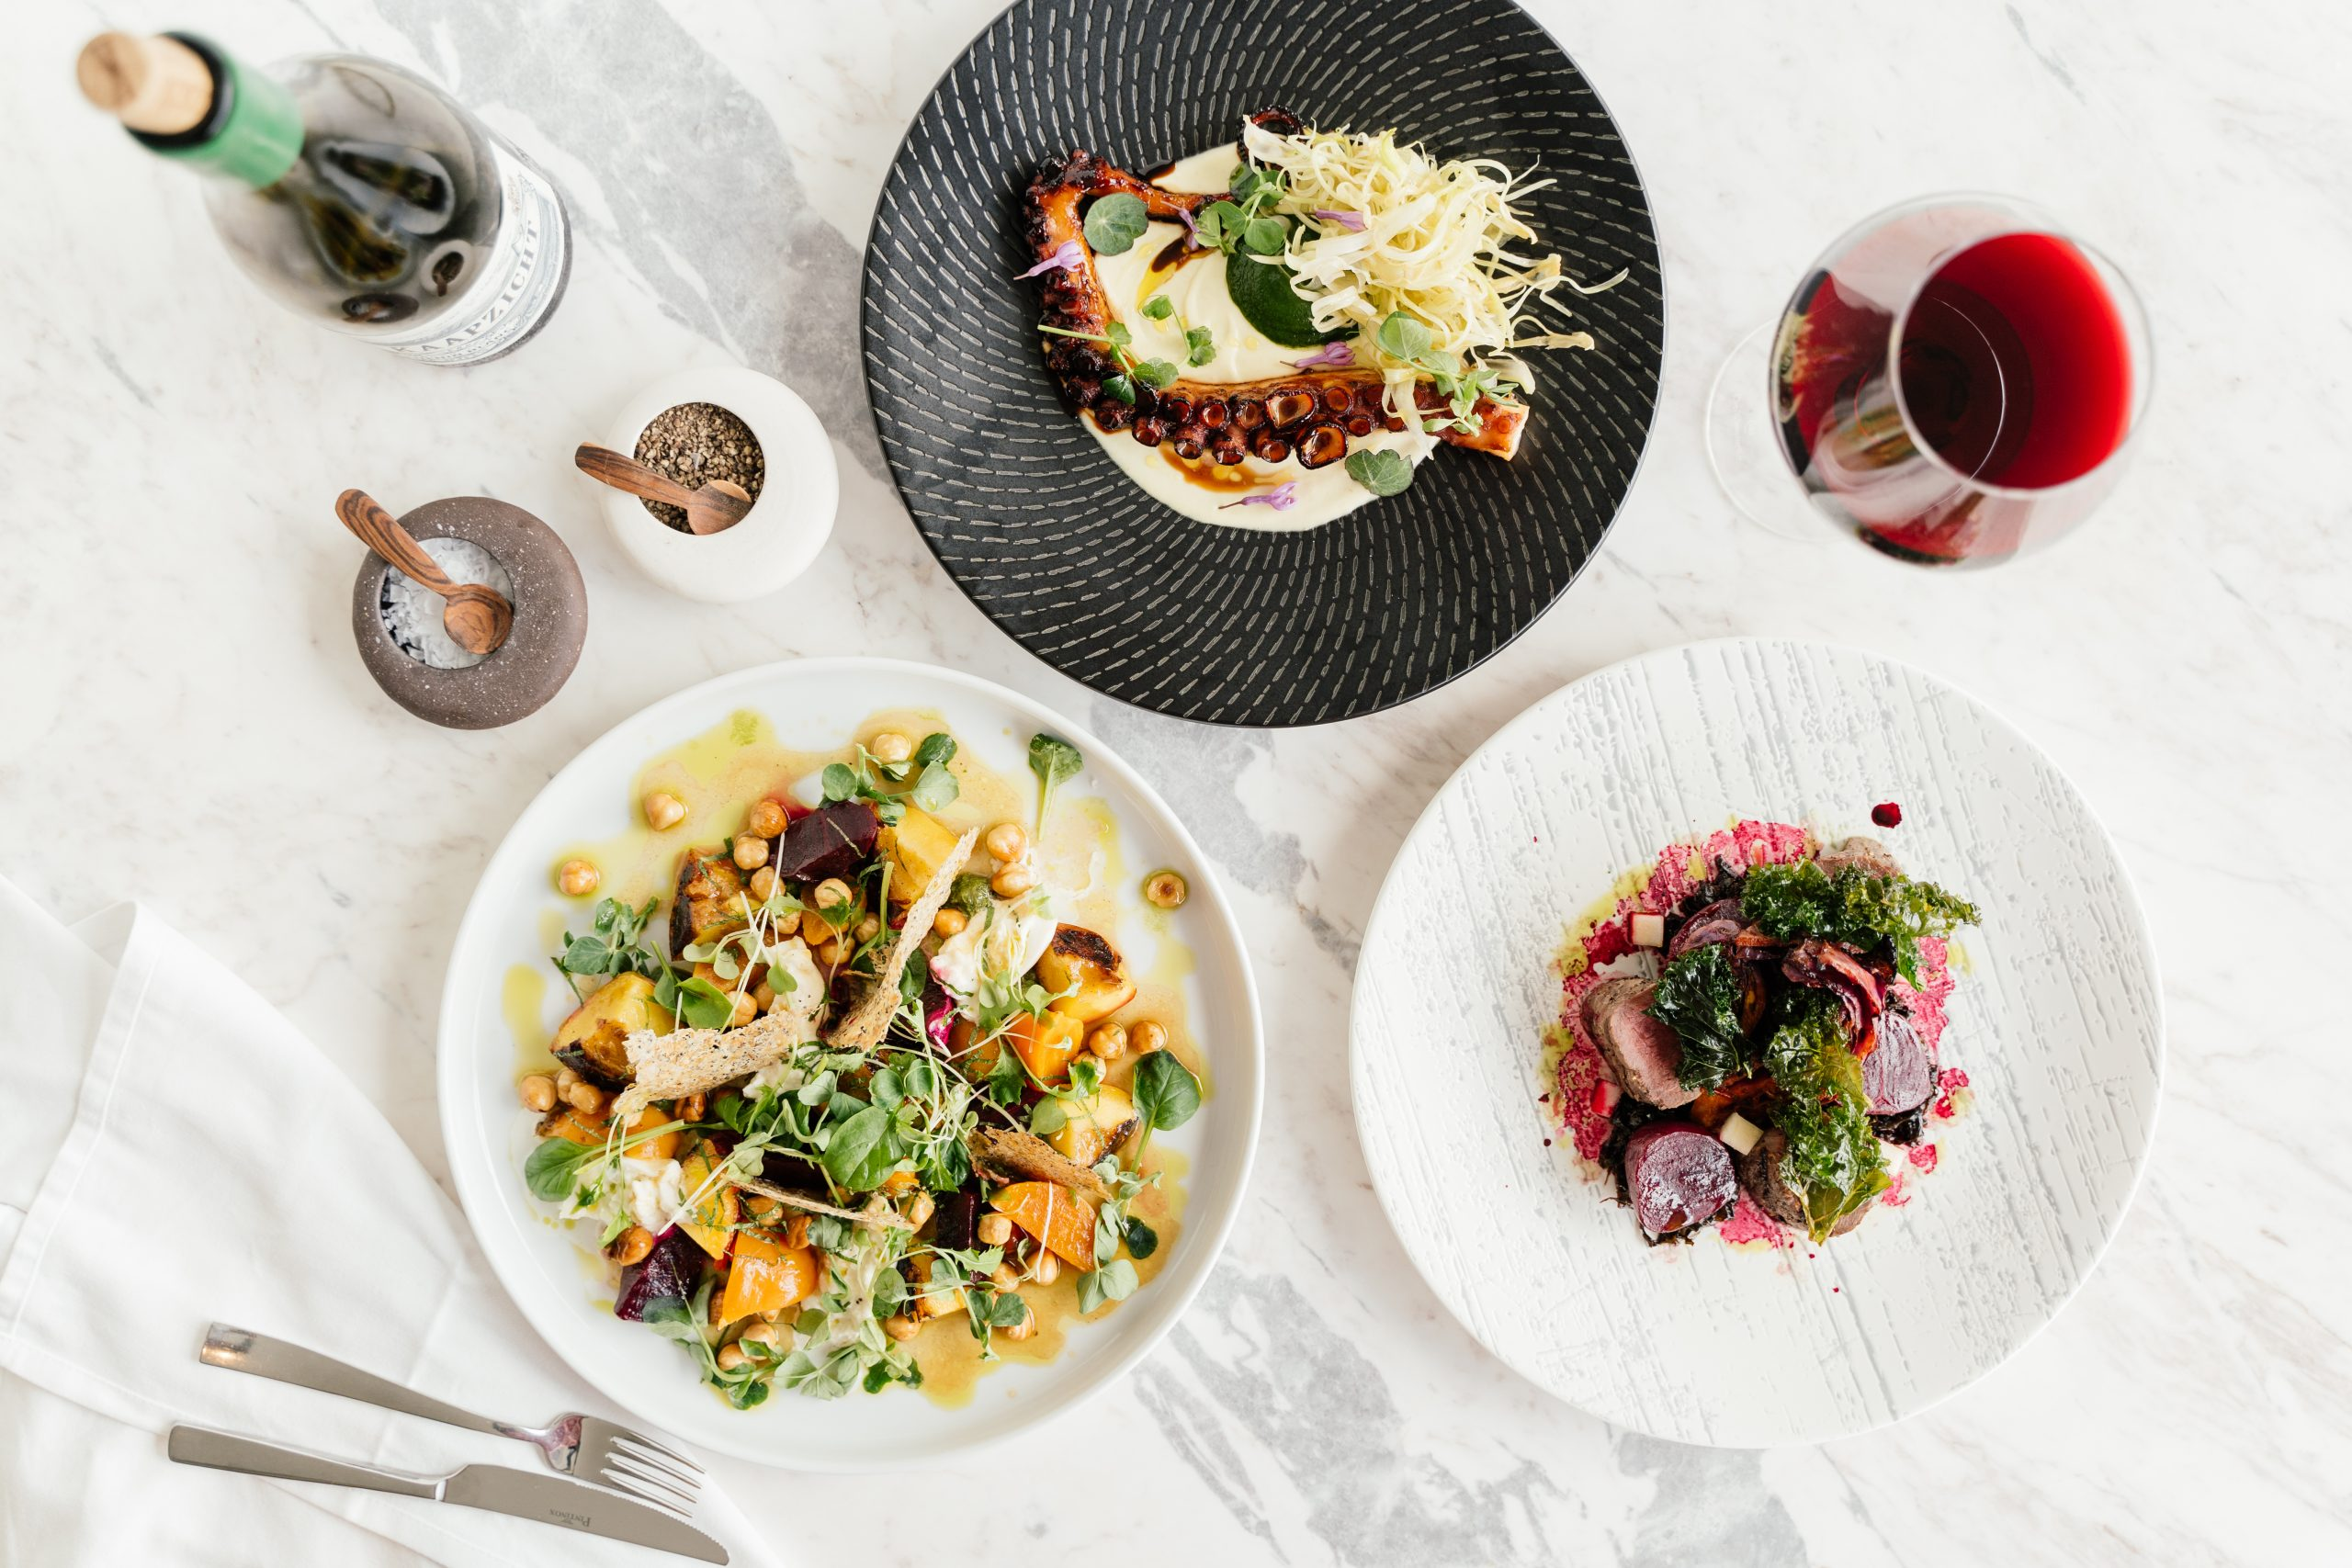 Séjour restaurant - Food & Wine